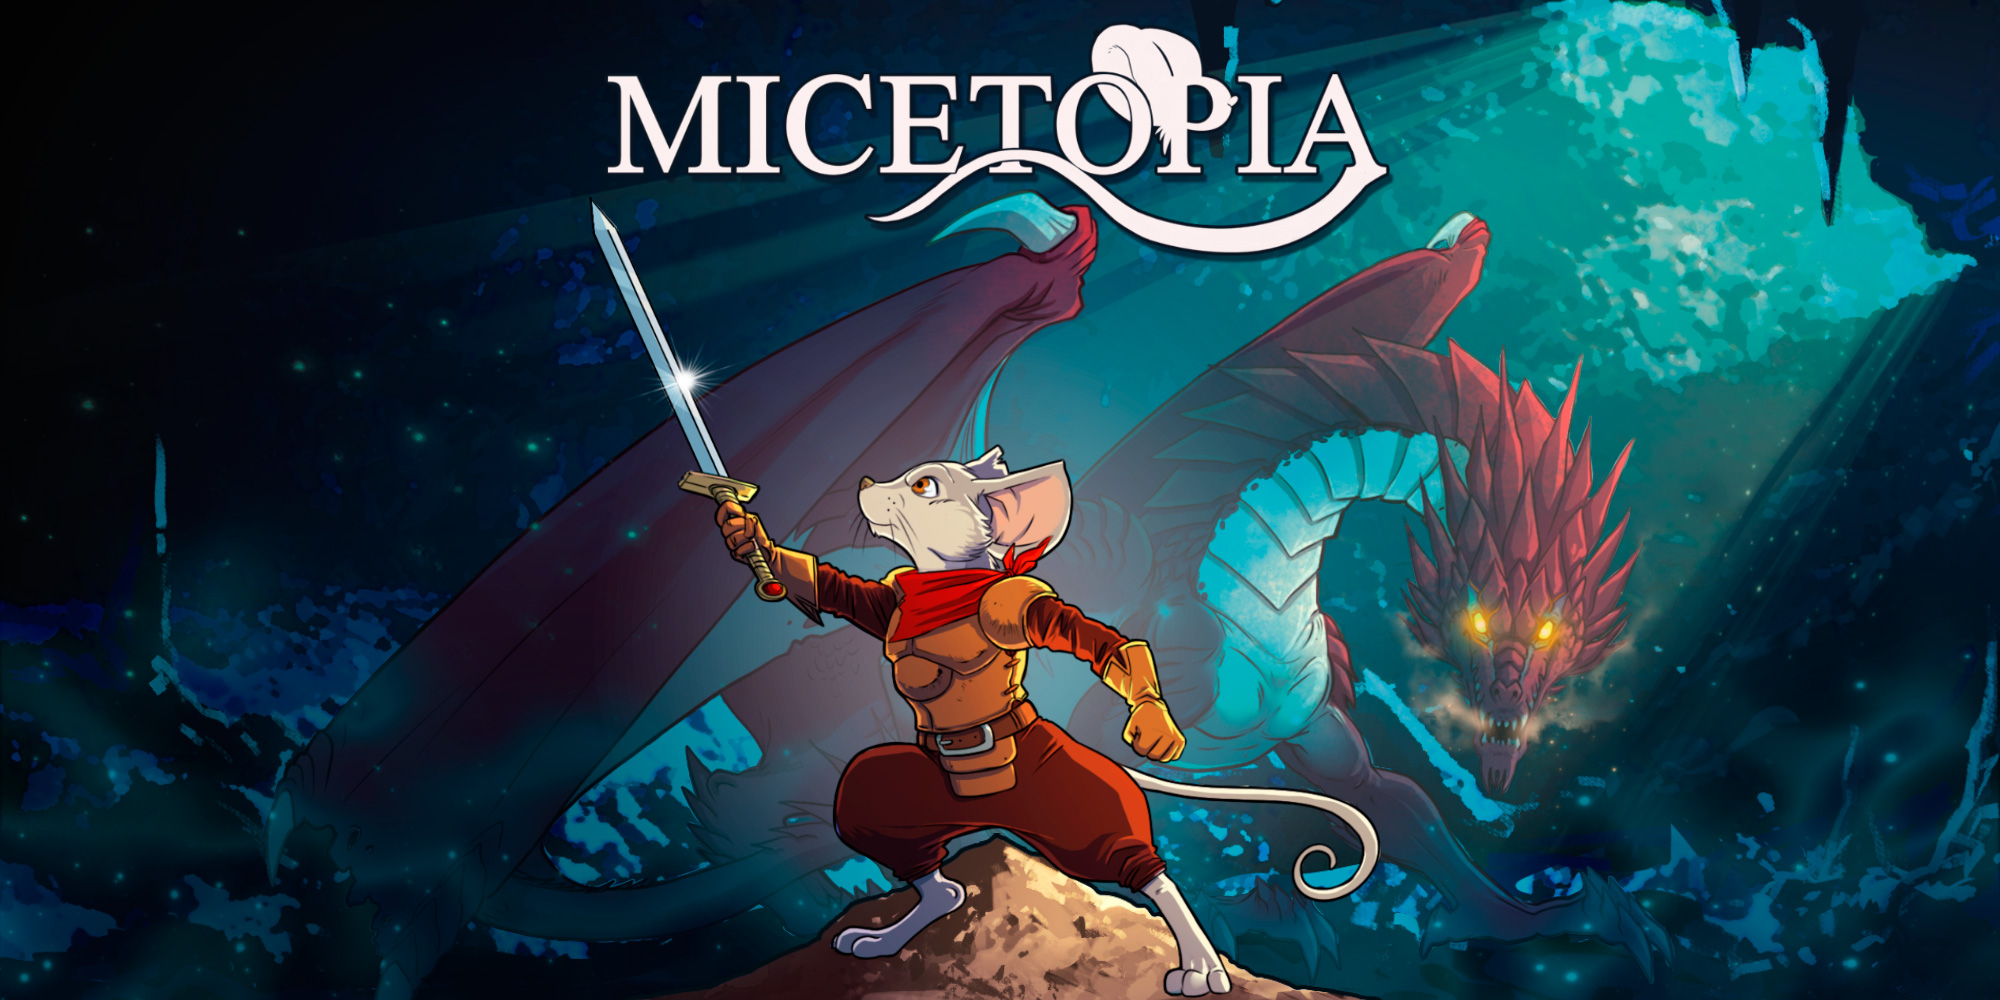 Micetopia-1.jpg